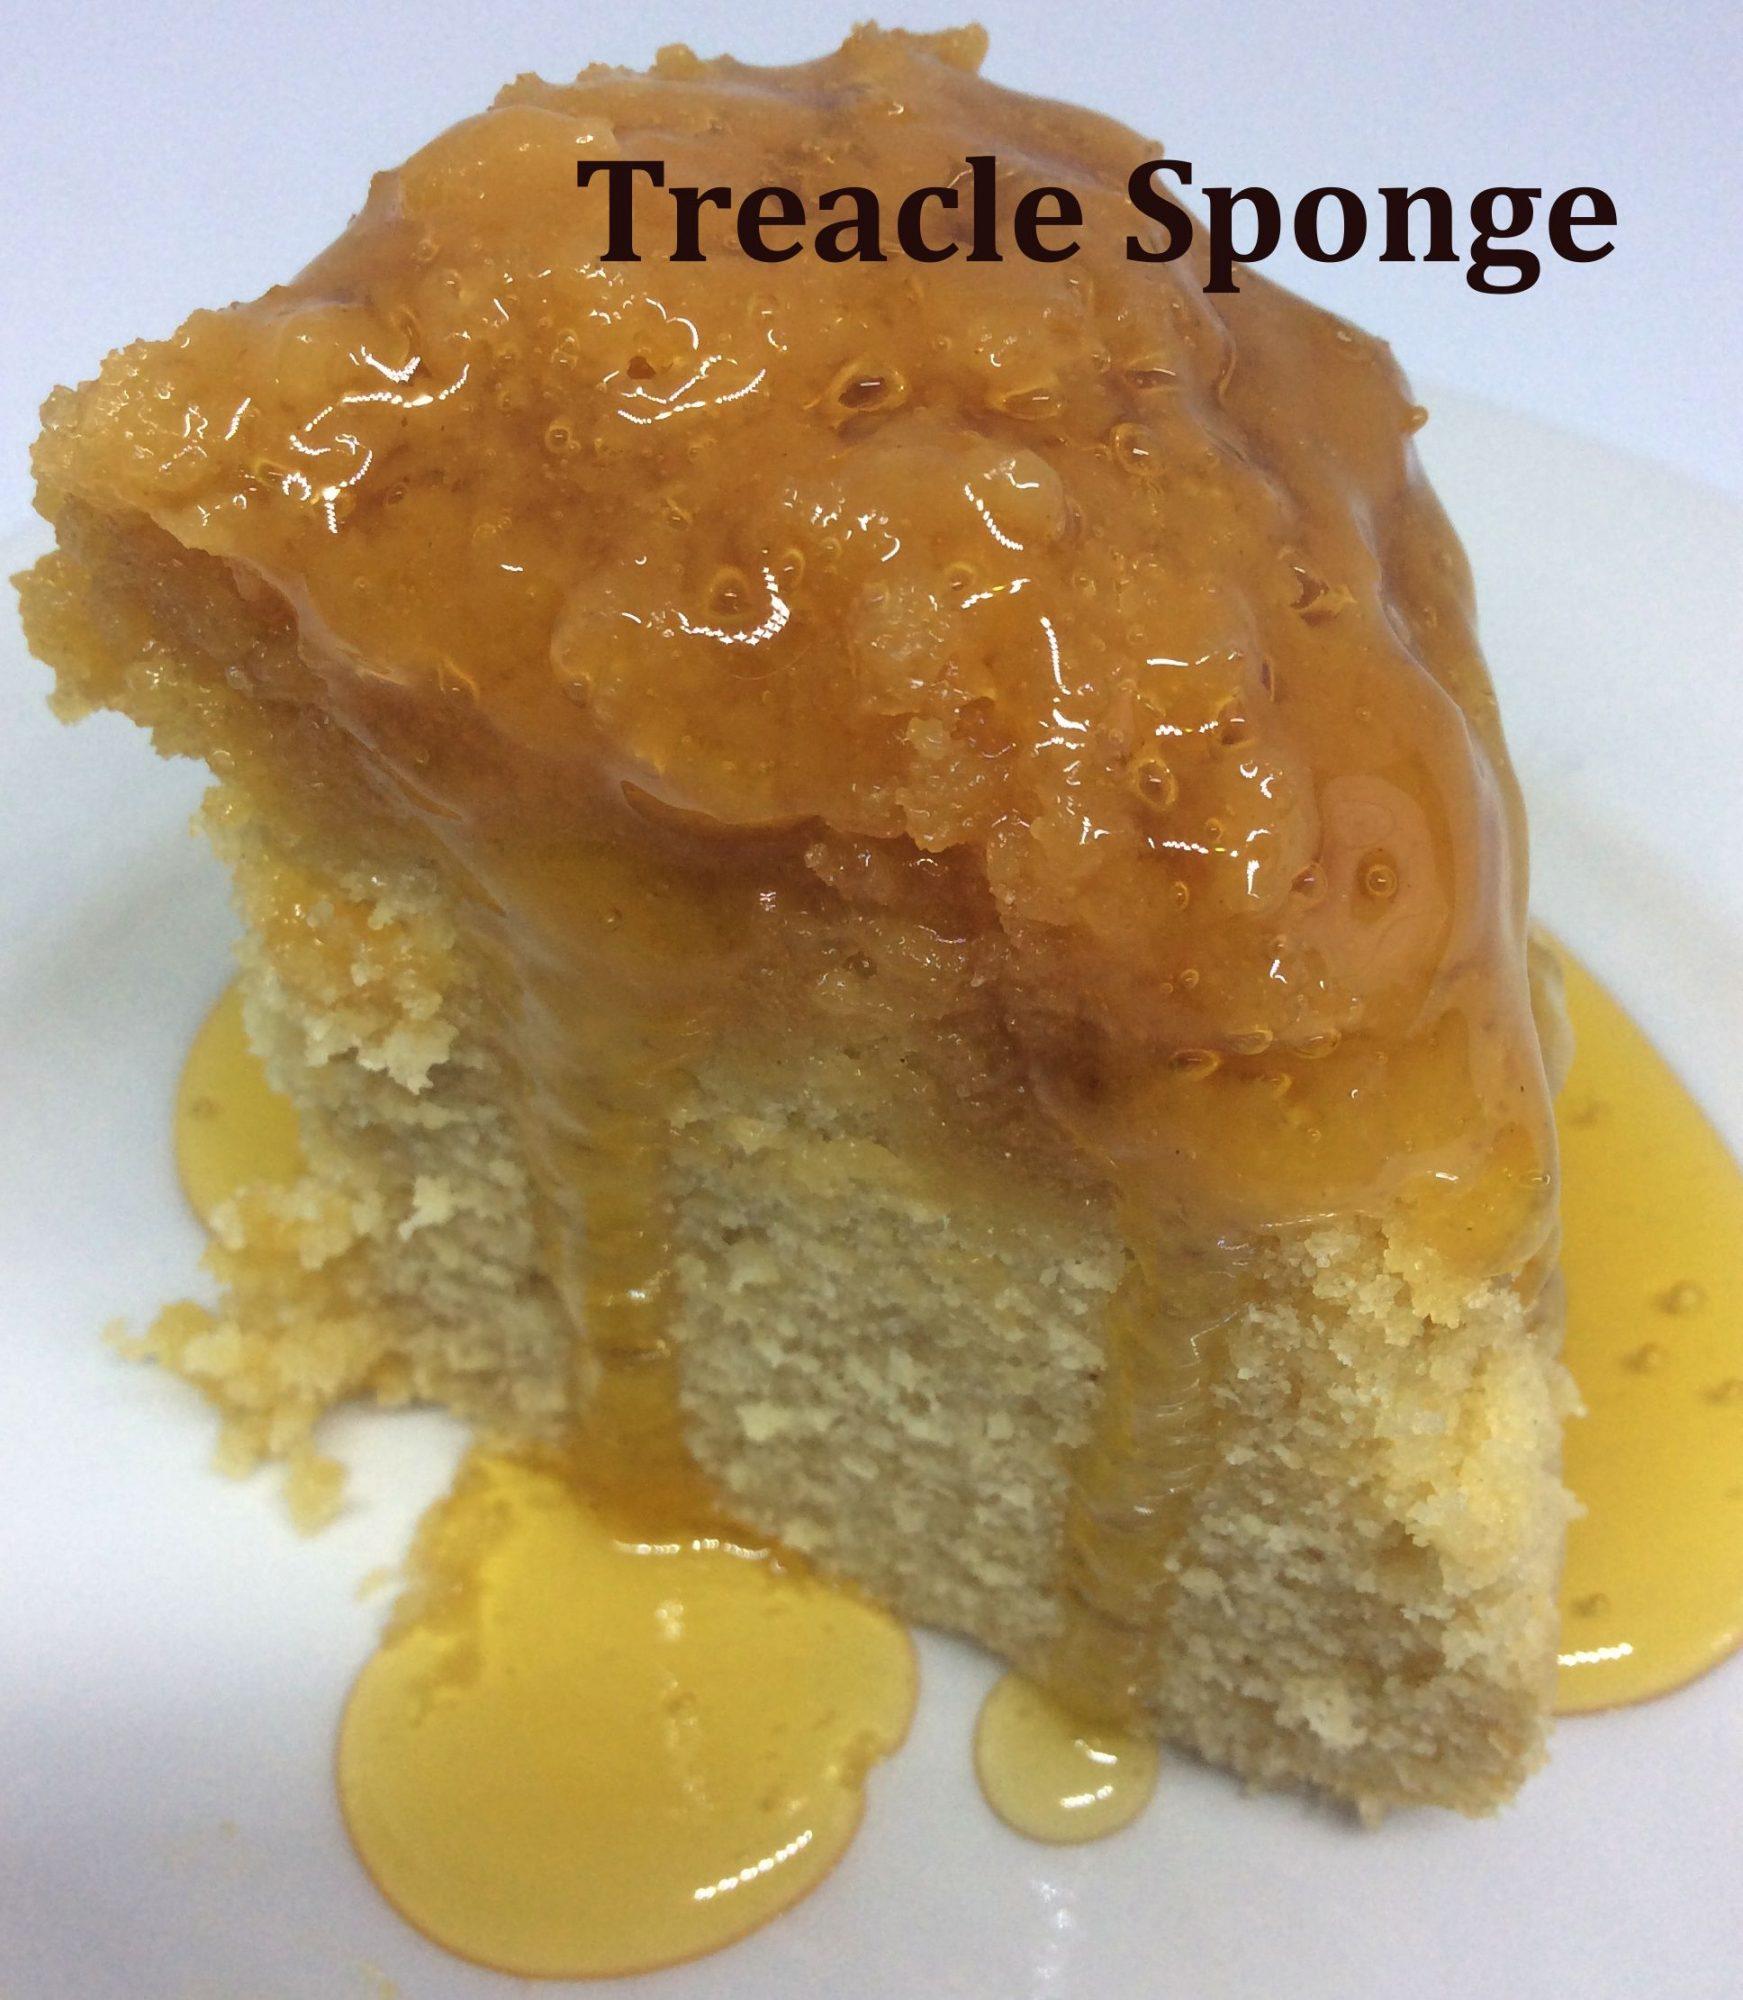 Treacle Sponge